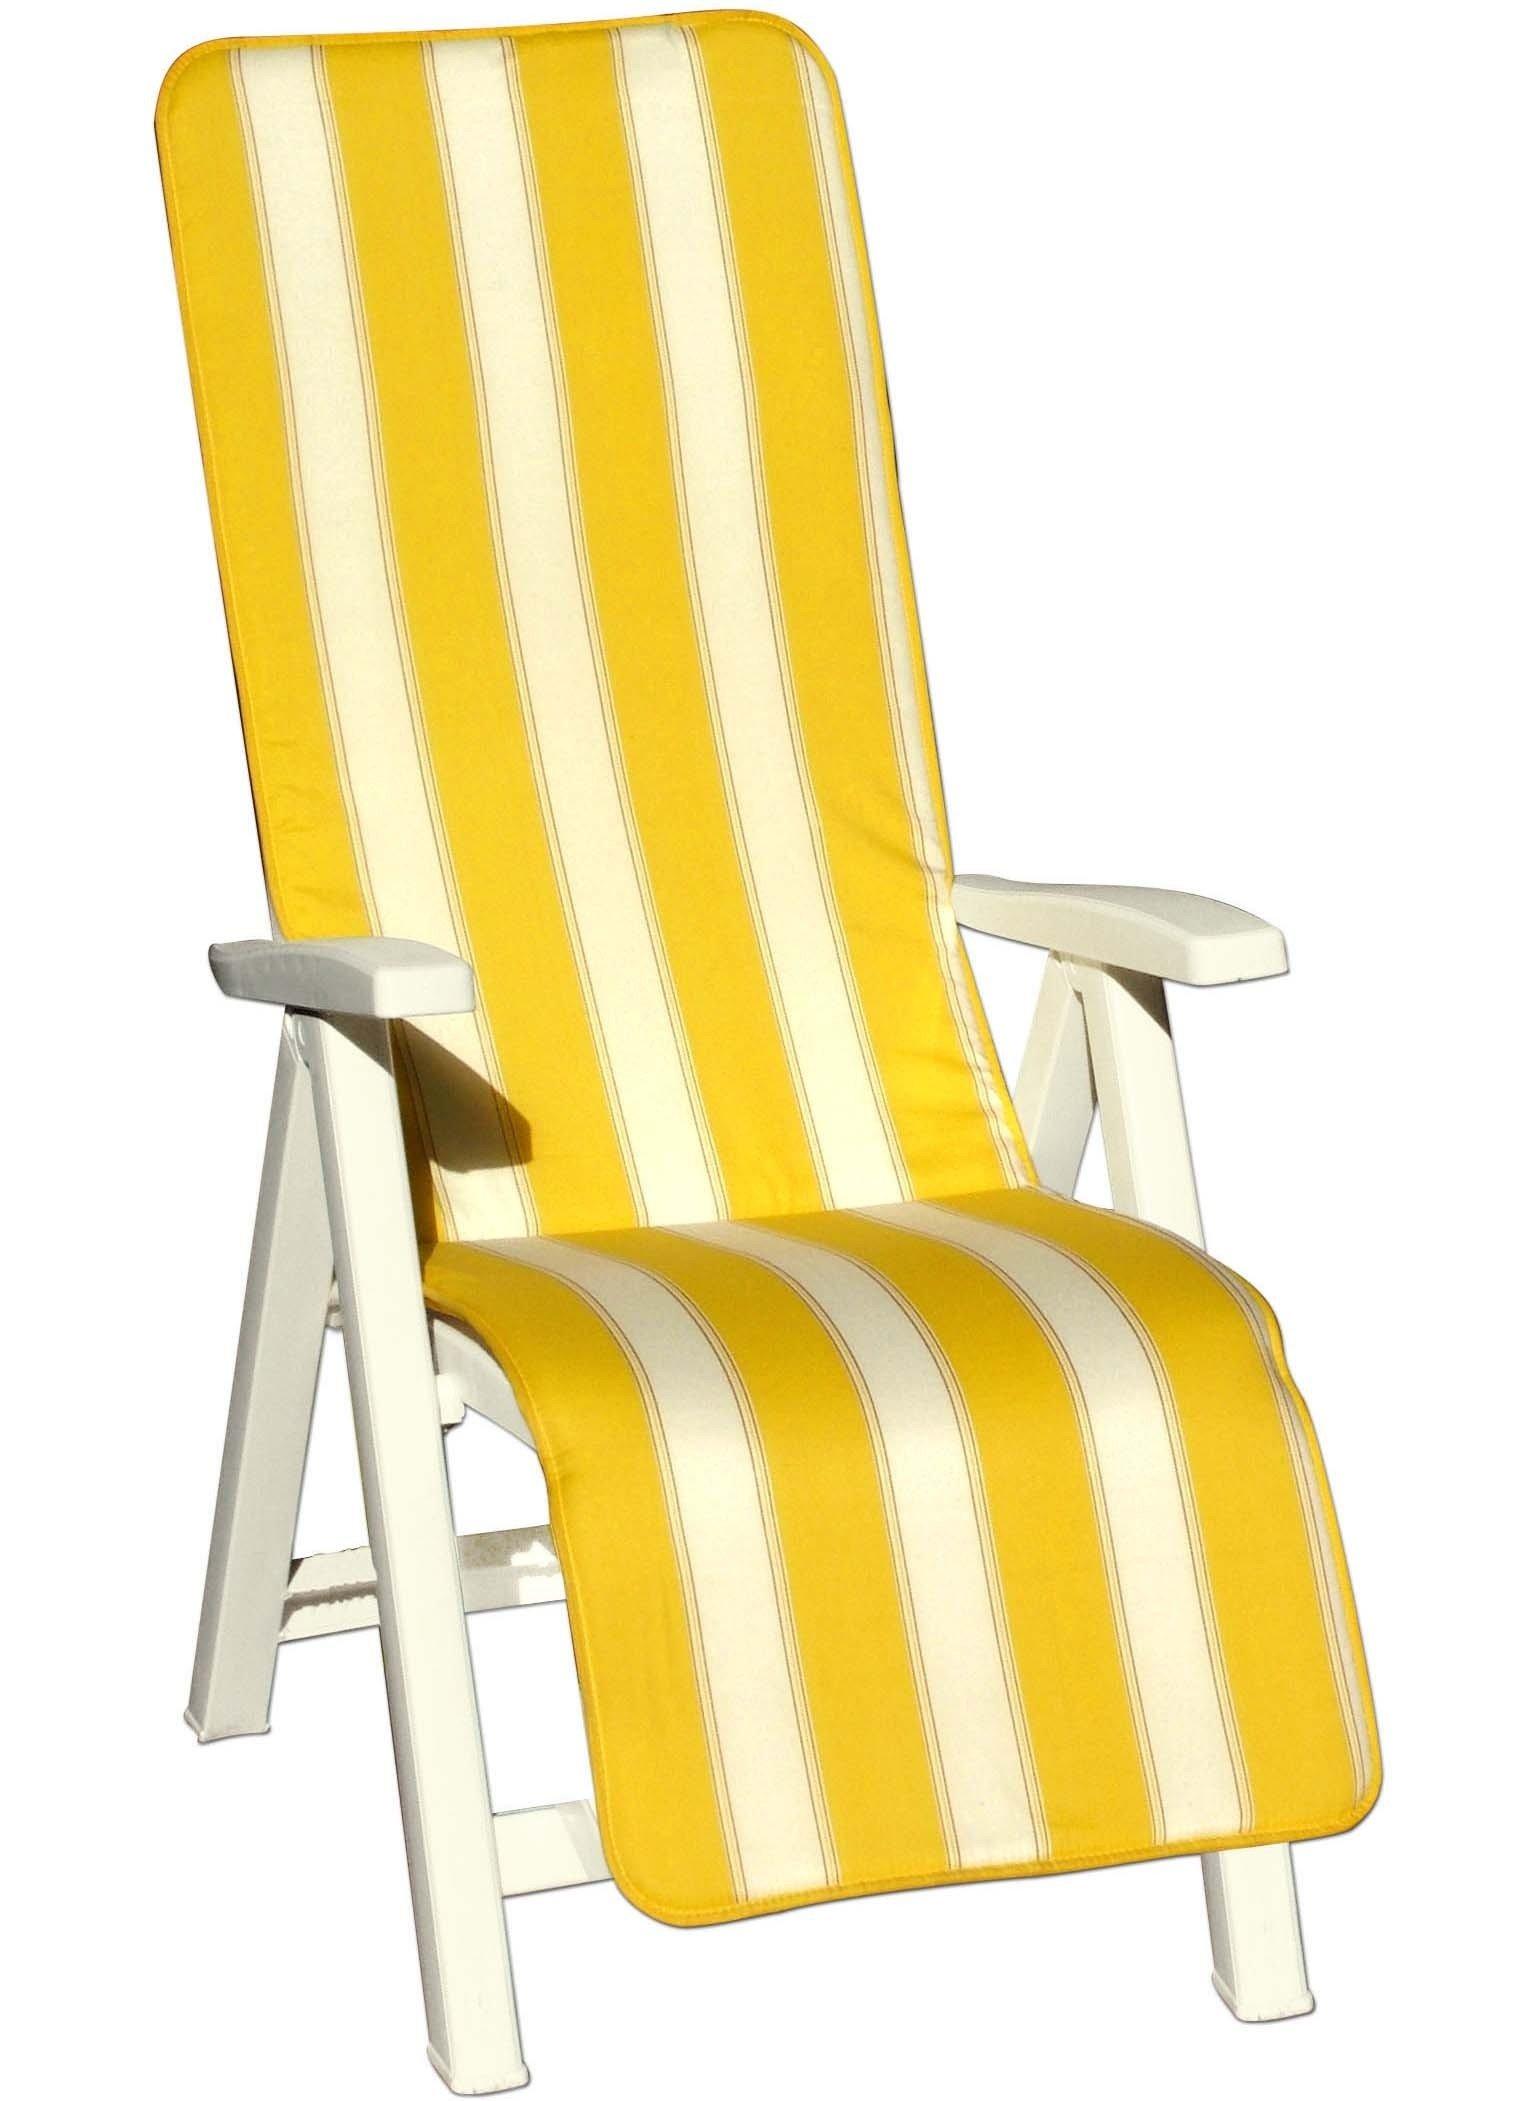 polster f r liegestuhl garten haushalt. Black Bedroom Furniture Sets. Home Design Ideas